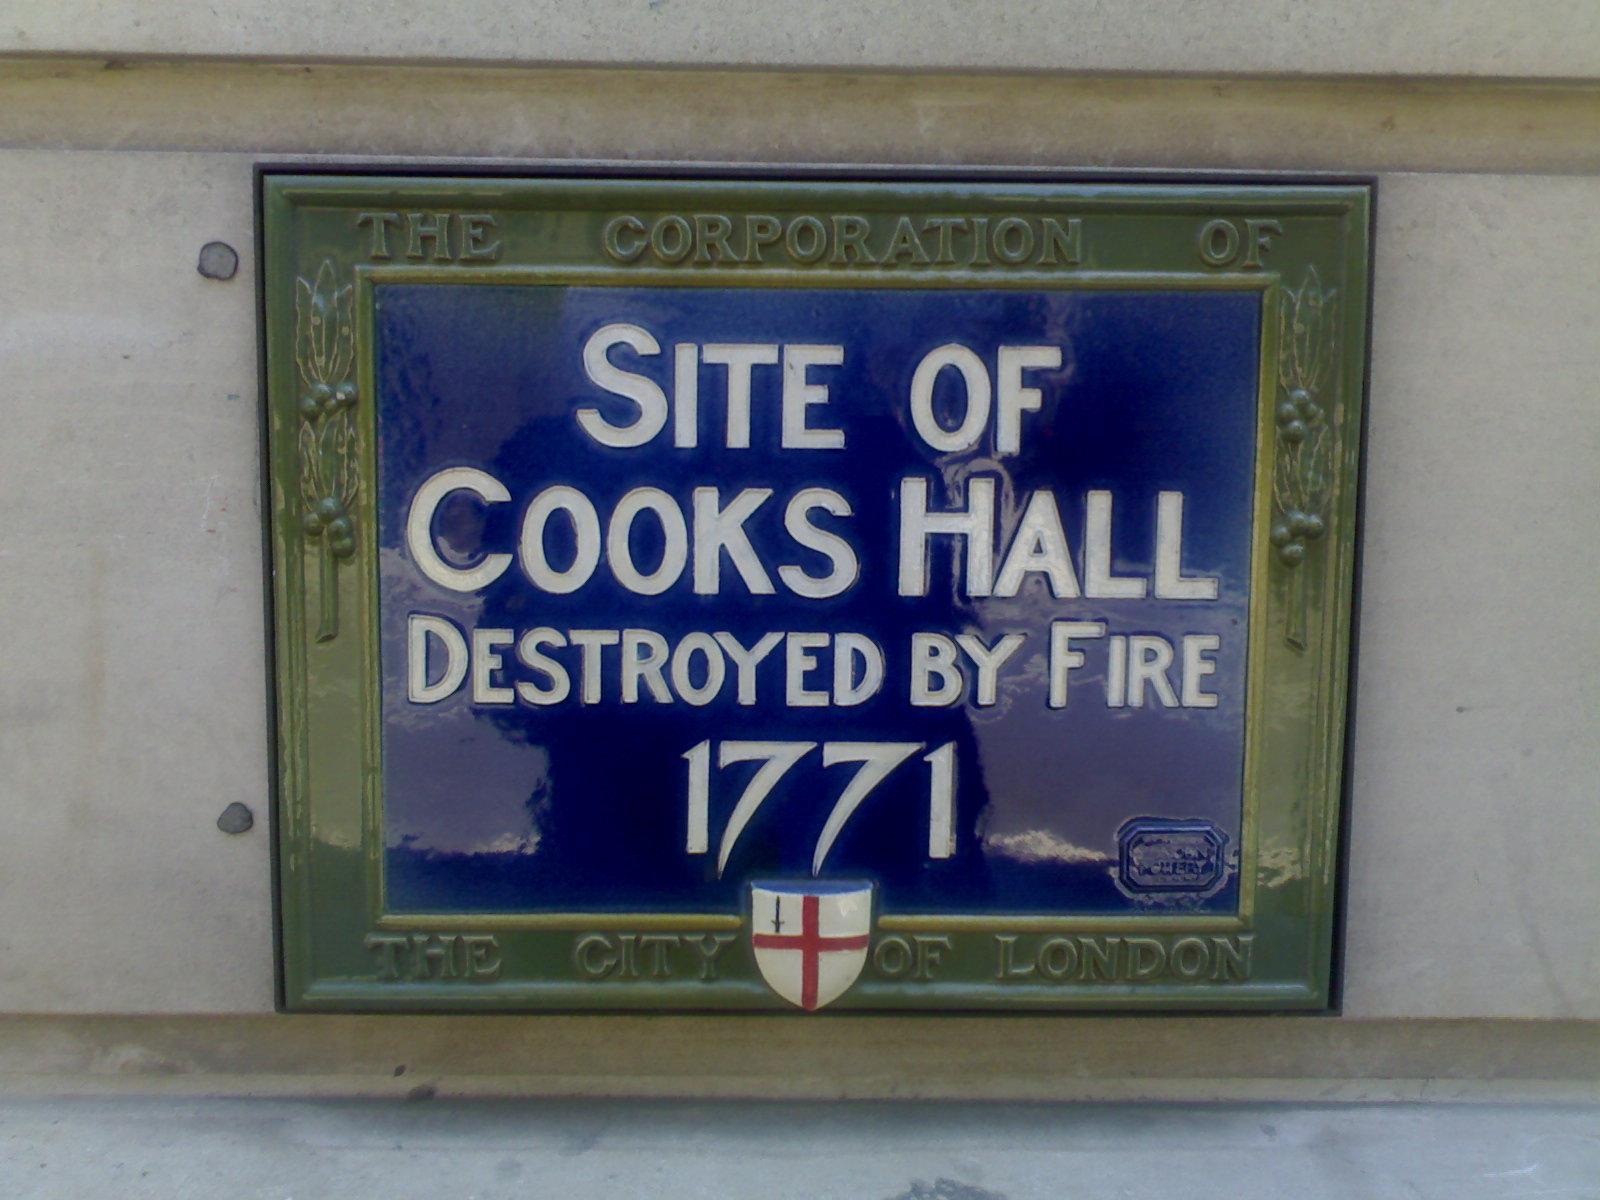 Cooks Hall site - 1771